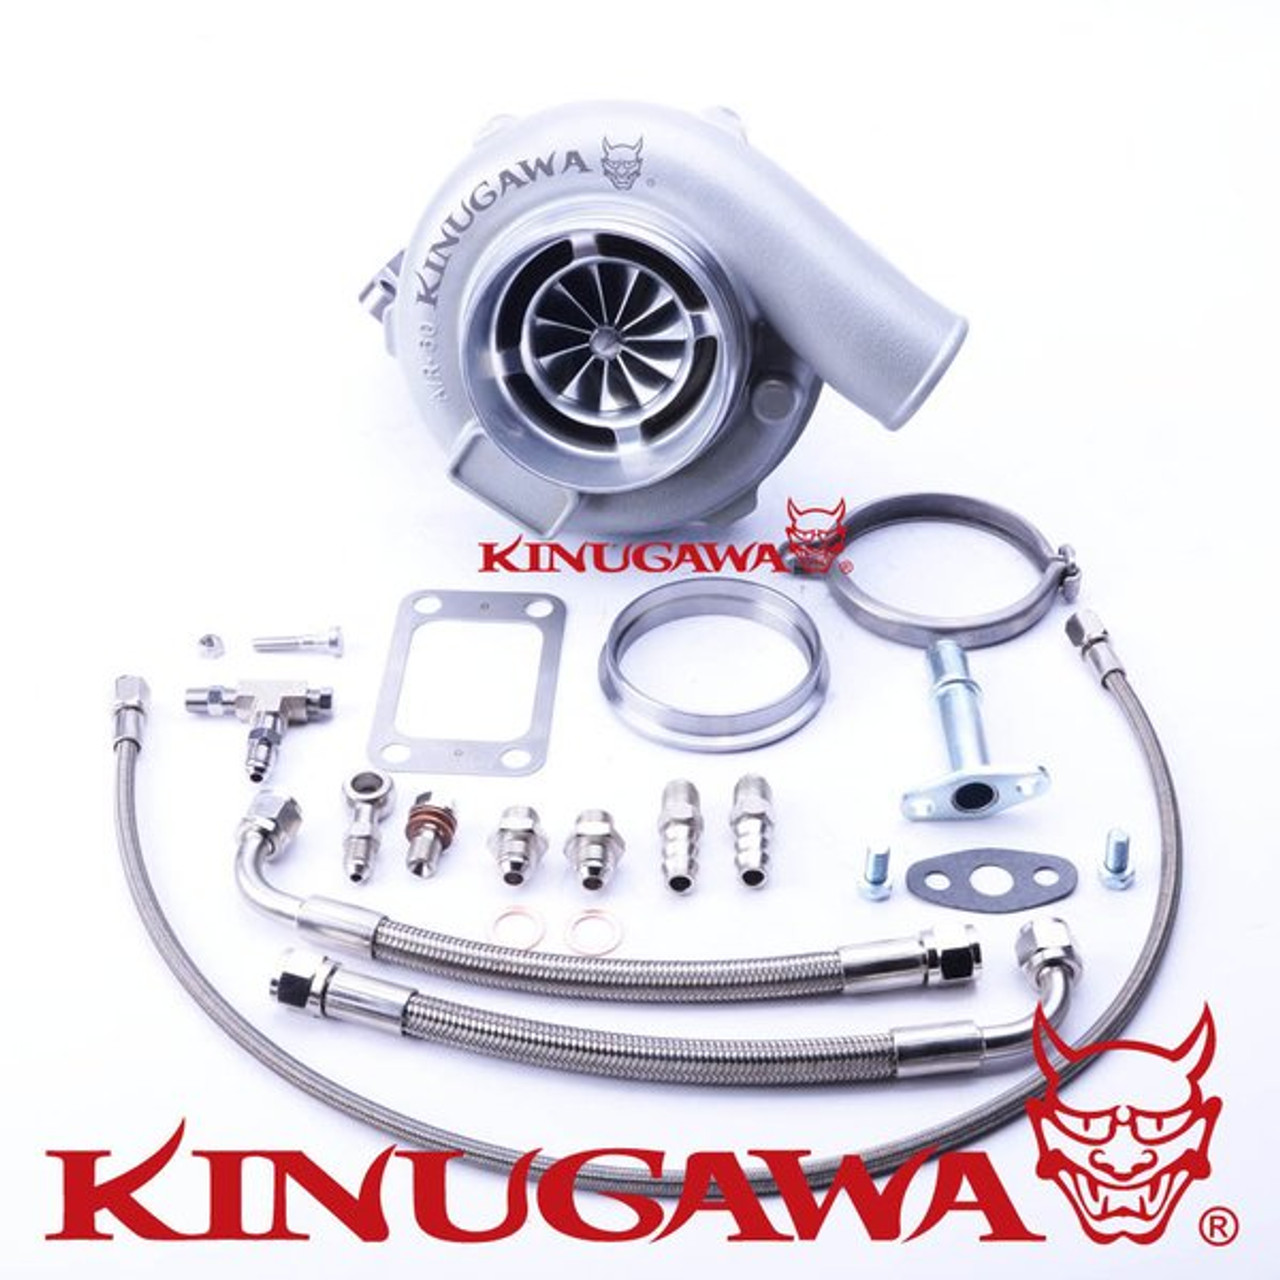 "Kinugawa Ball Bearing Turbocharger 4"" Anti Surge GTX3071R 60mm w/ .64 T3 V-Band"